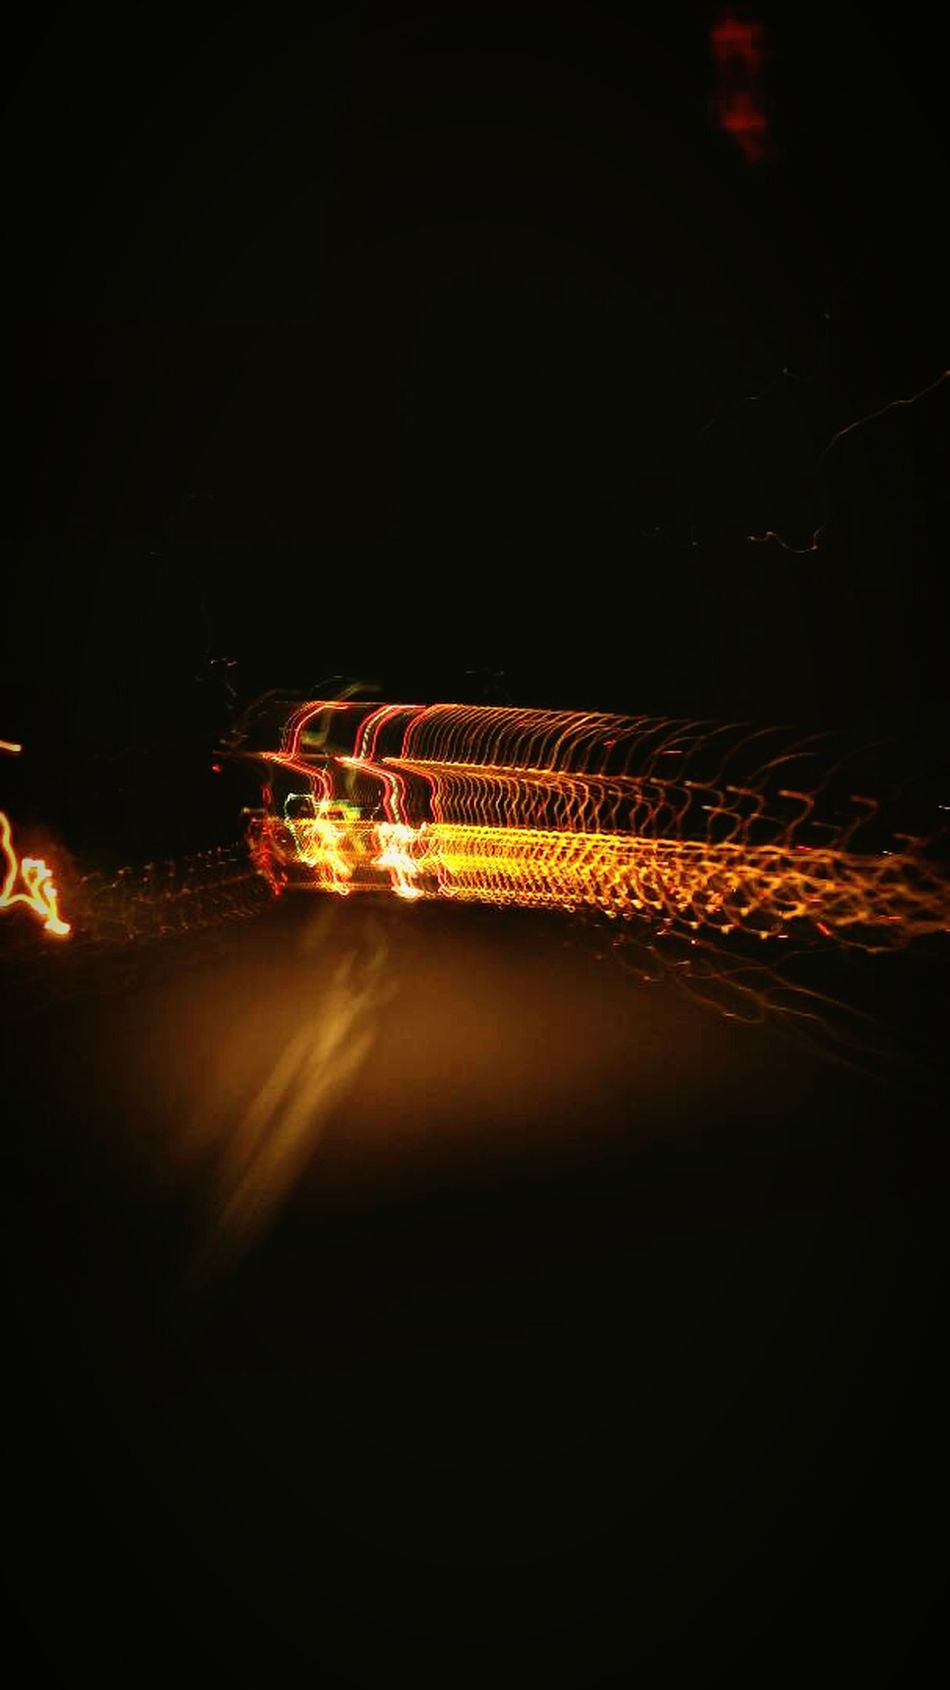 Lightning! Shutter speed trick. Shutter Speed Night Outdoors City Road Illuminated Lit mobilephotography Motion Mobilephoto Trippy Camera First Eyeem Photo